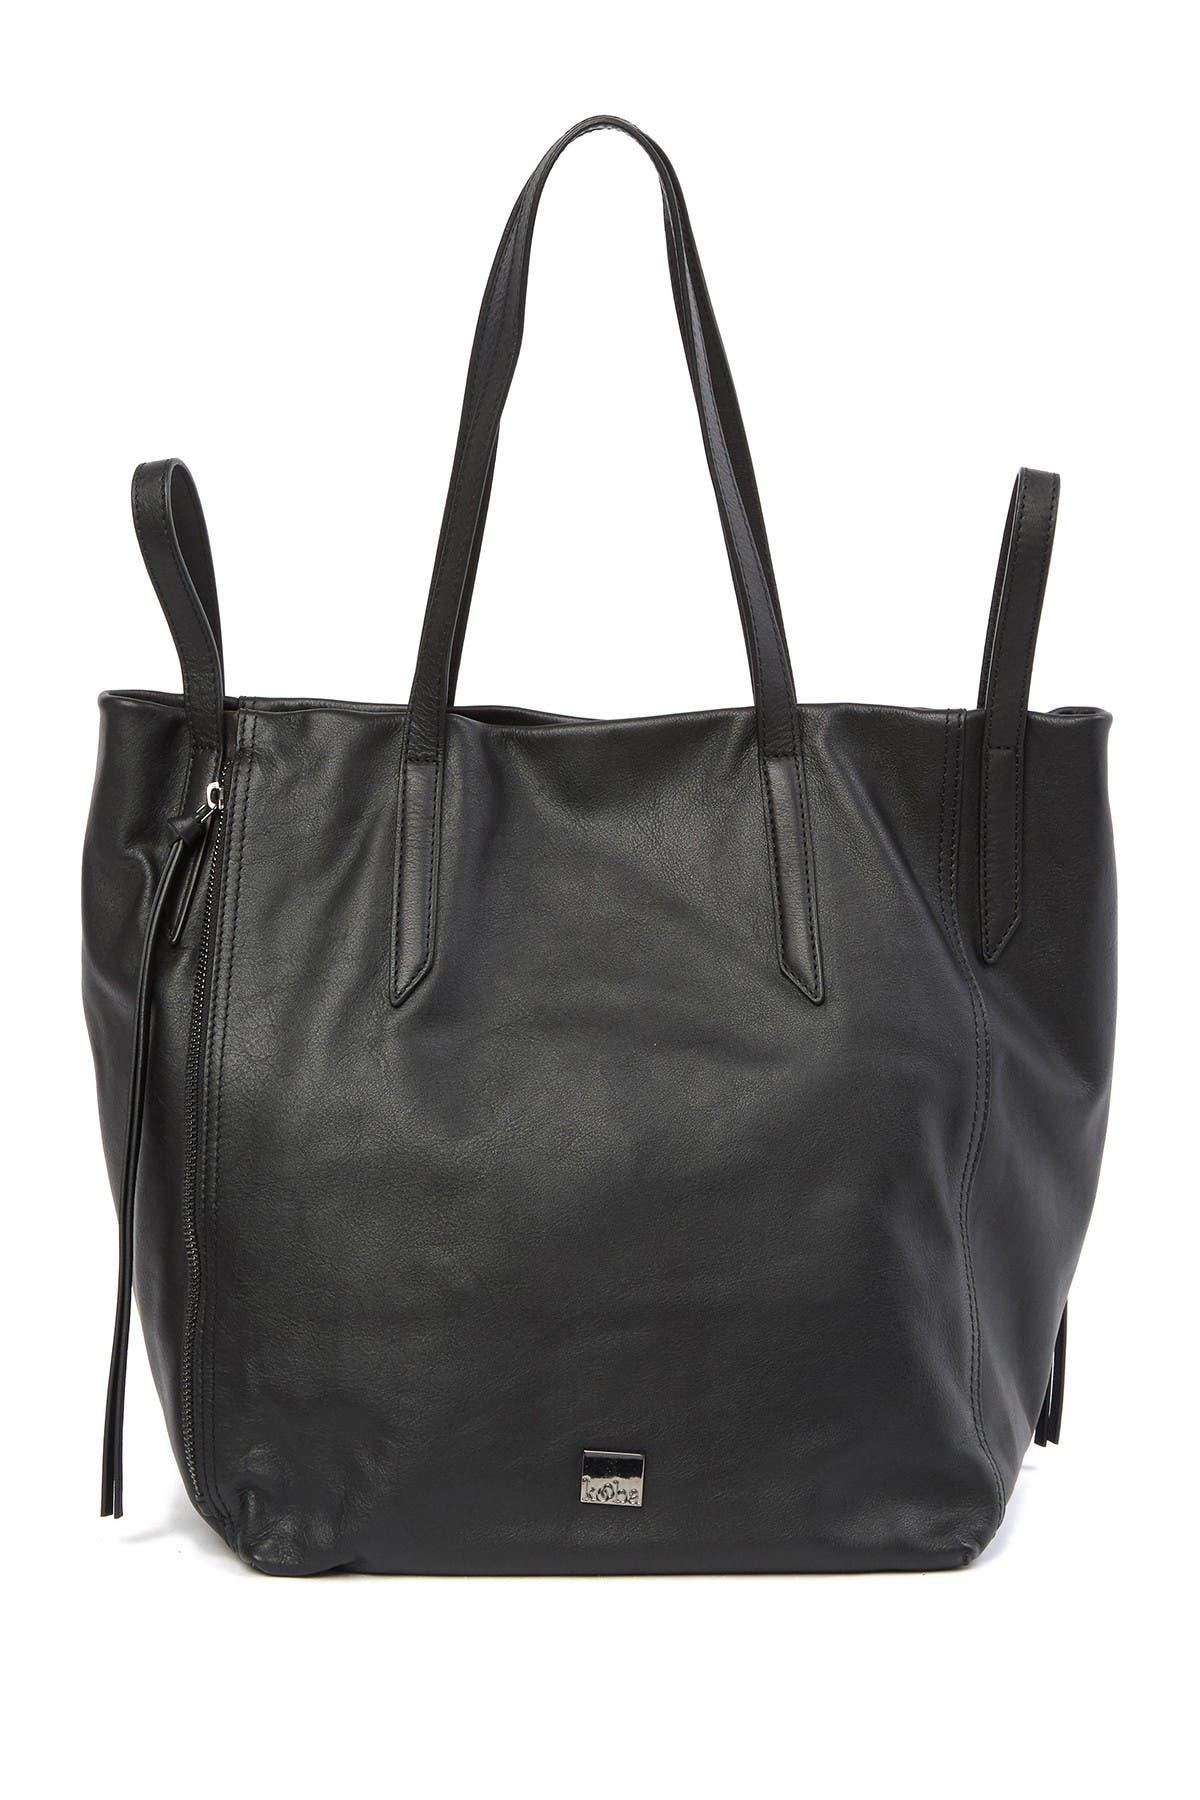 Image of Kooba Leather Zip Tote Bag